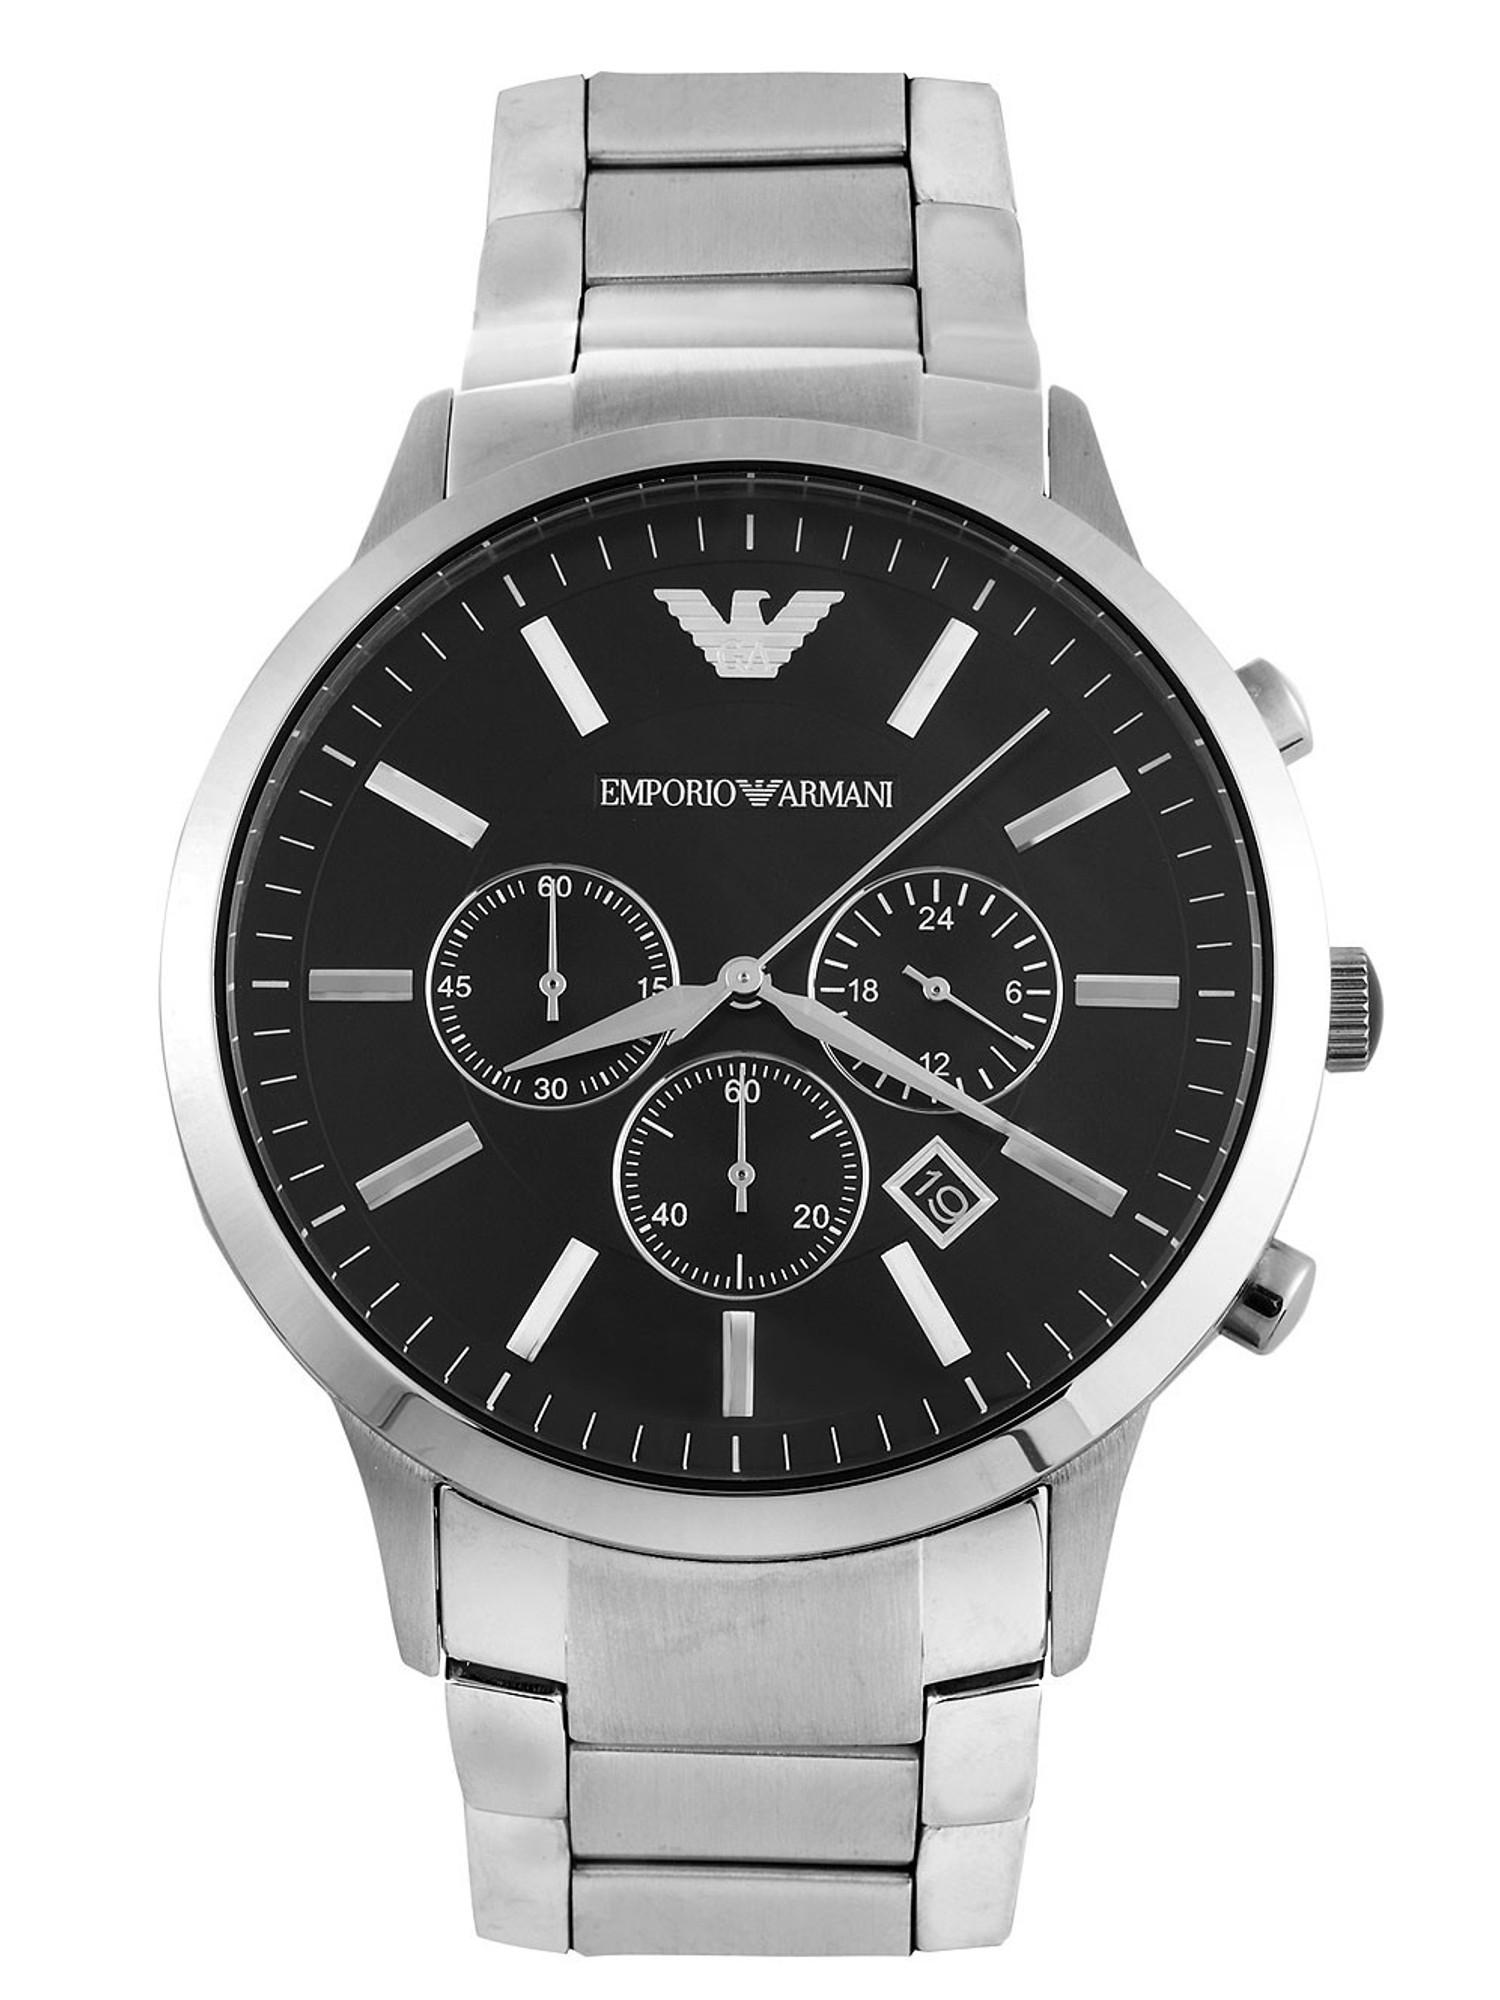 EMPORIO ARMANI Sportivo Watch Chronograph AR2460